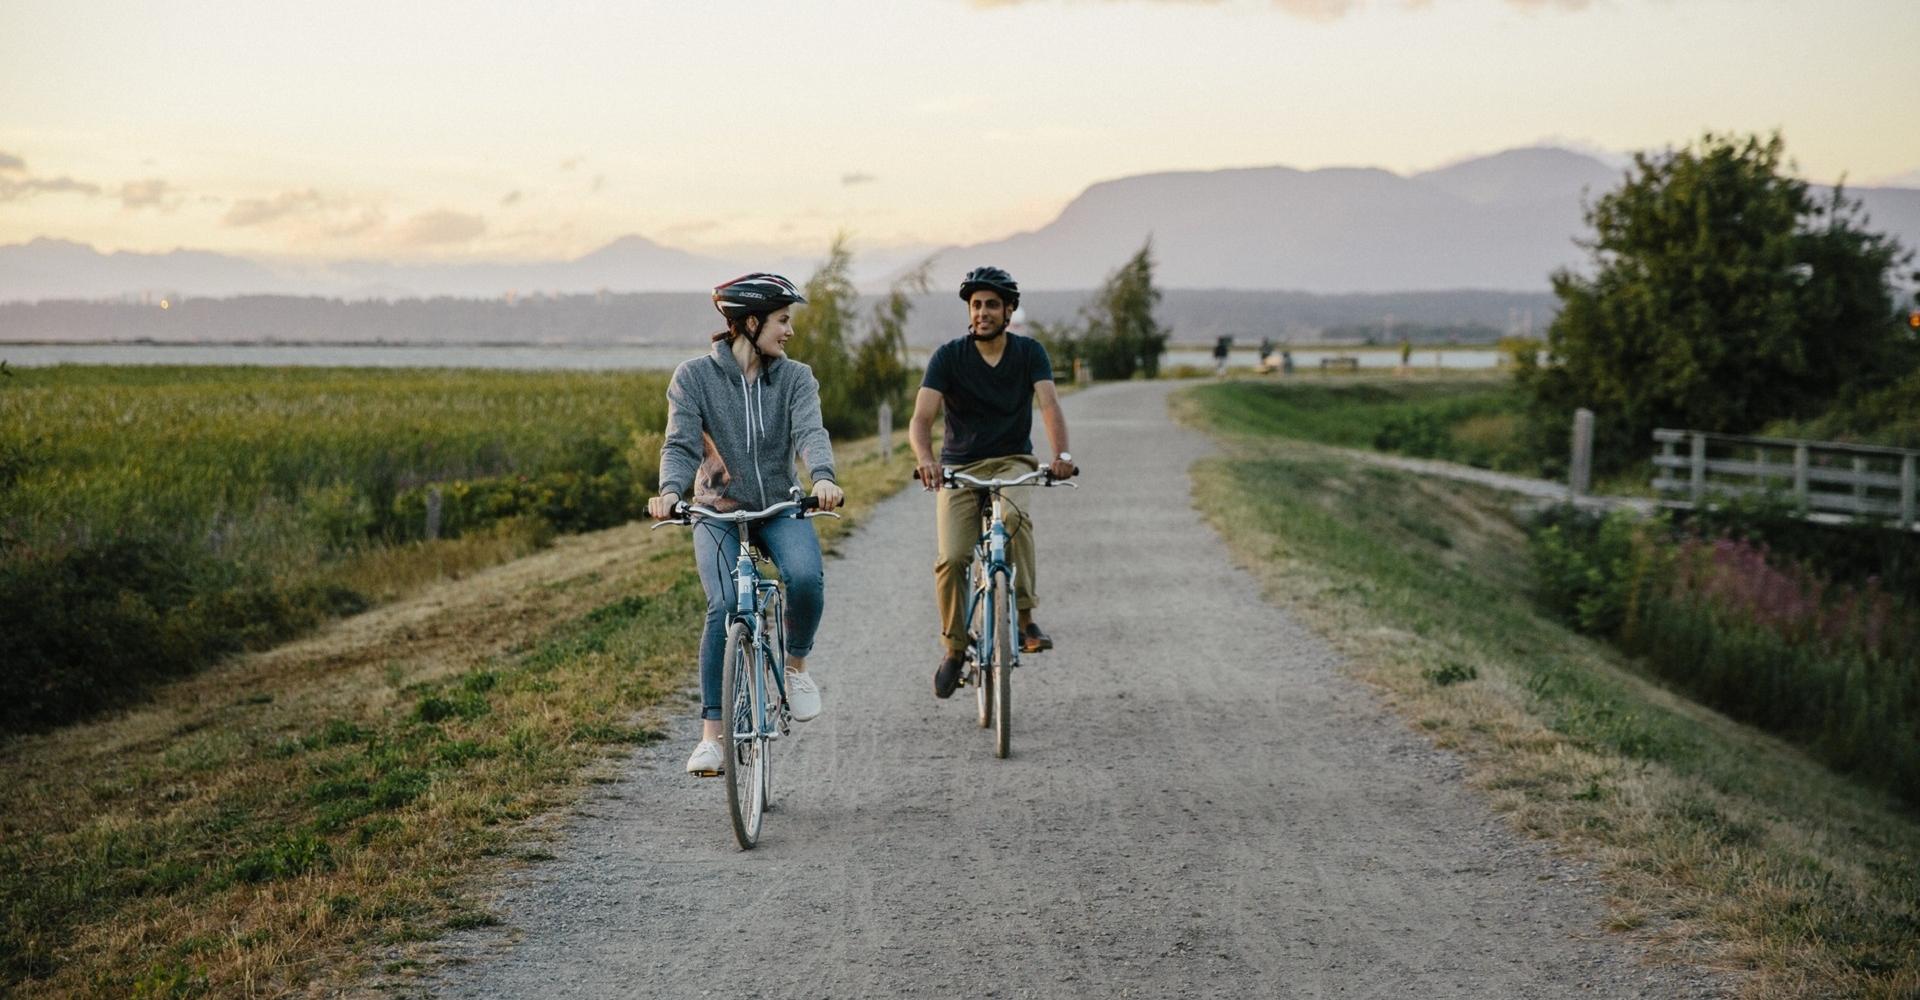 Cycling in Richmond | Tourism Richmond